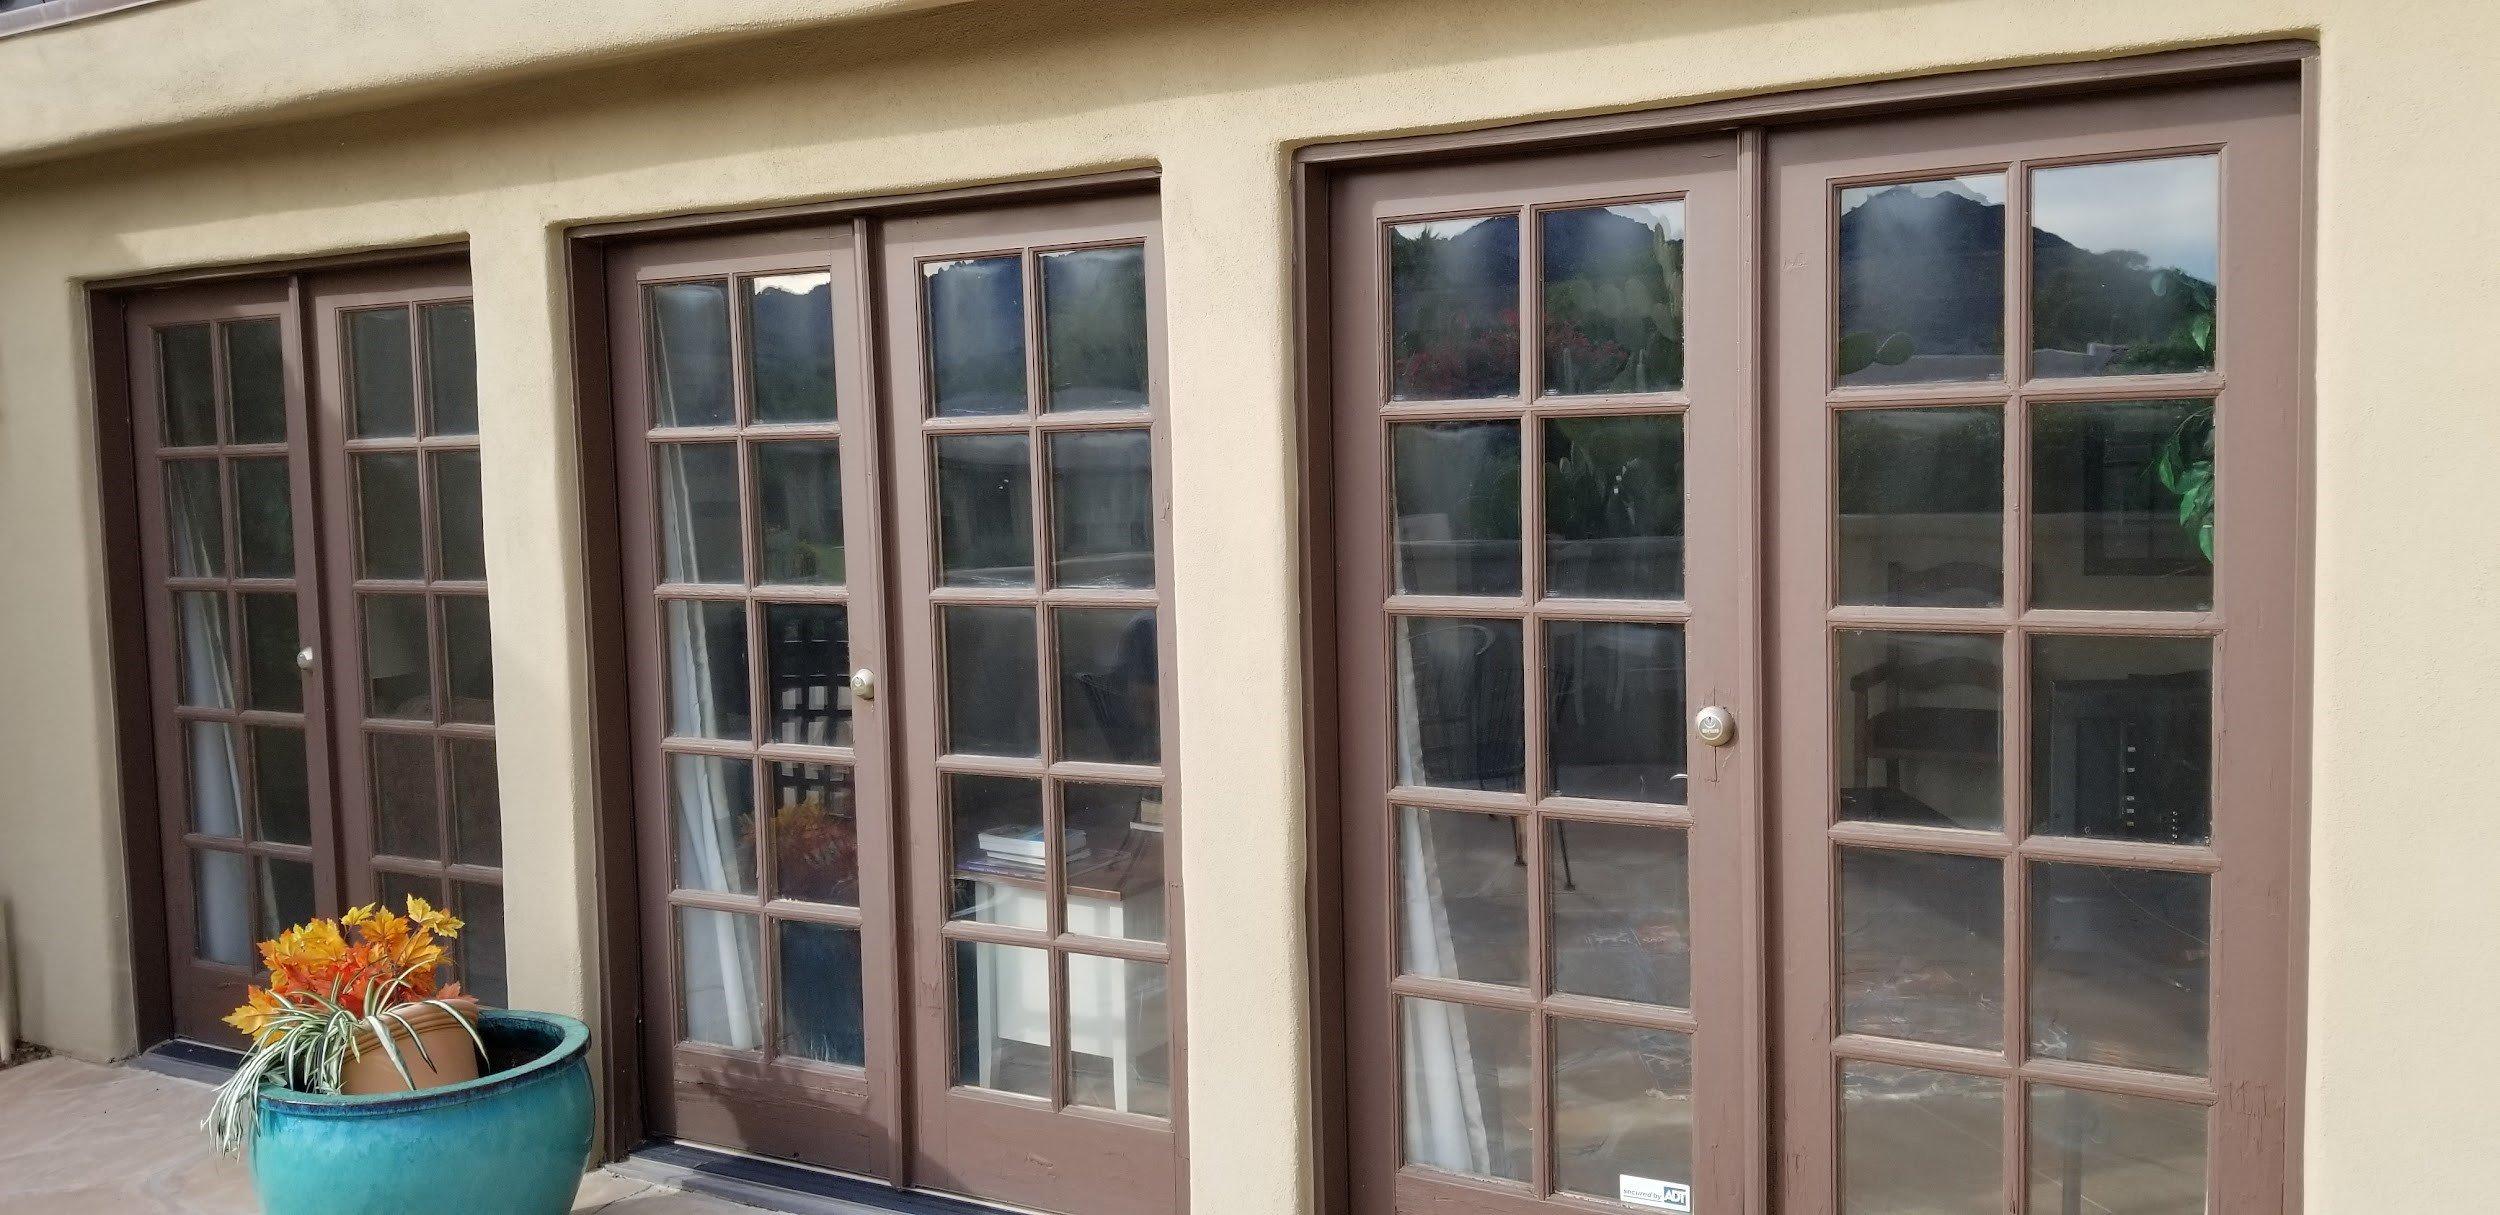 New French Doors In Chandler AZ